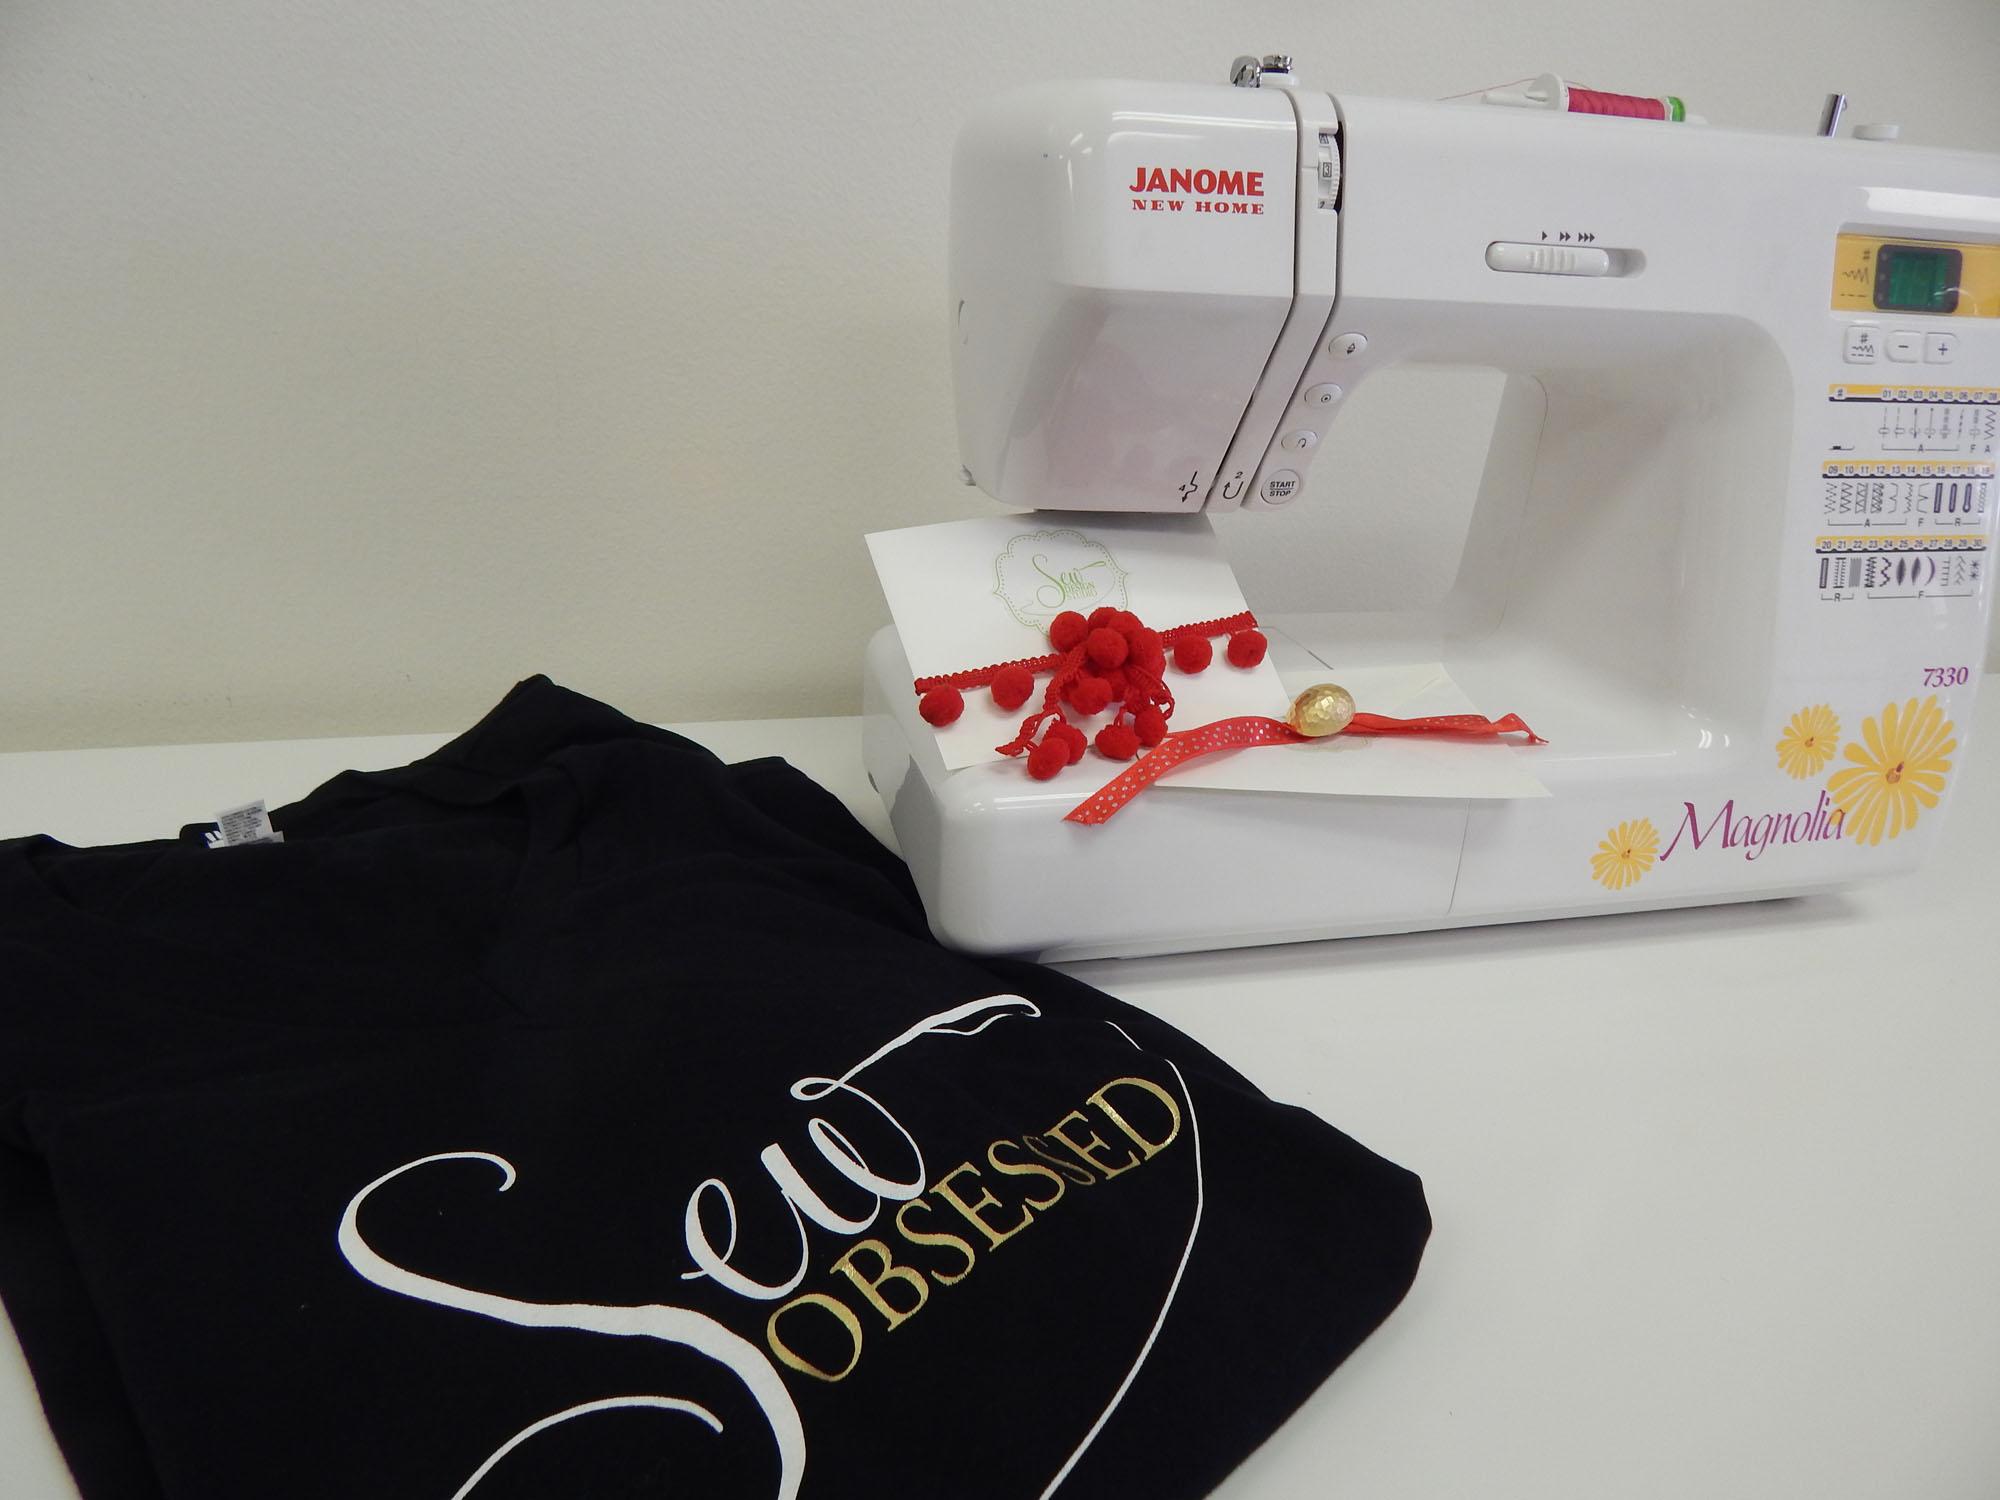 sewing machine houston